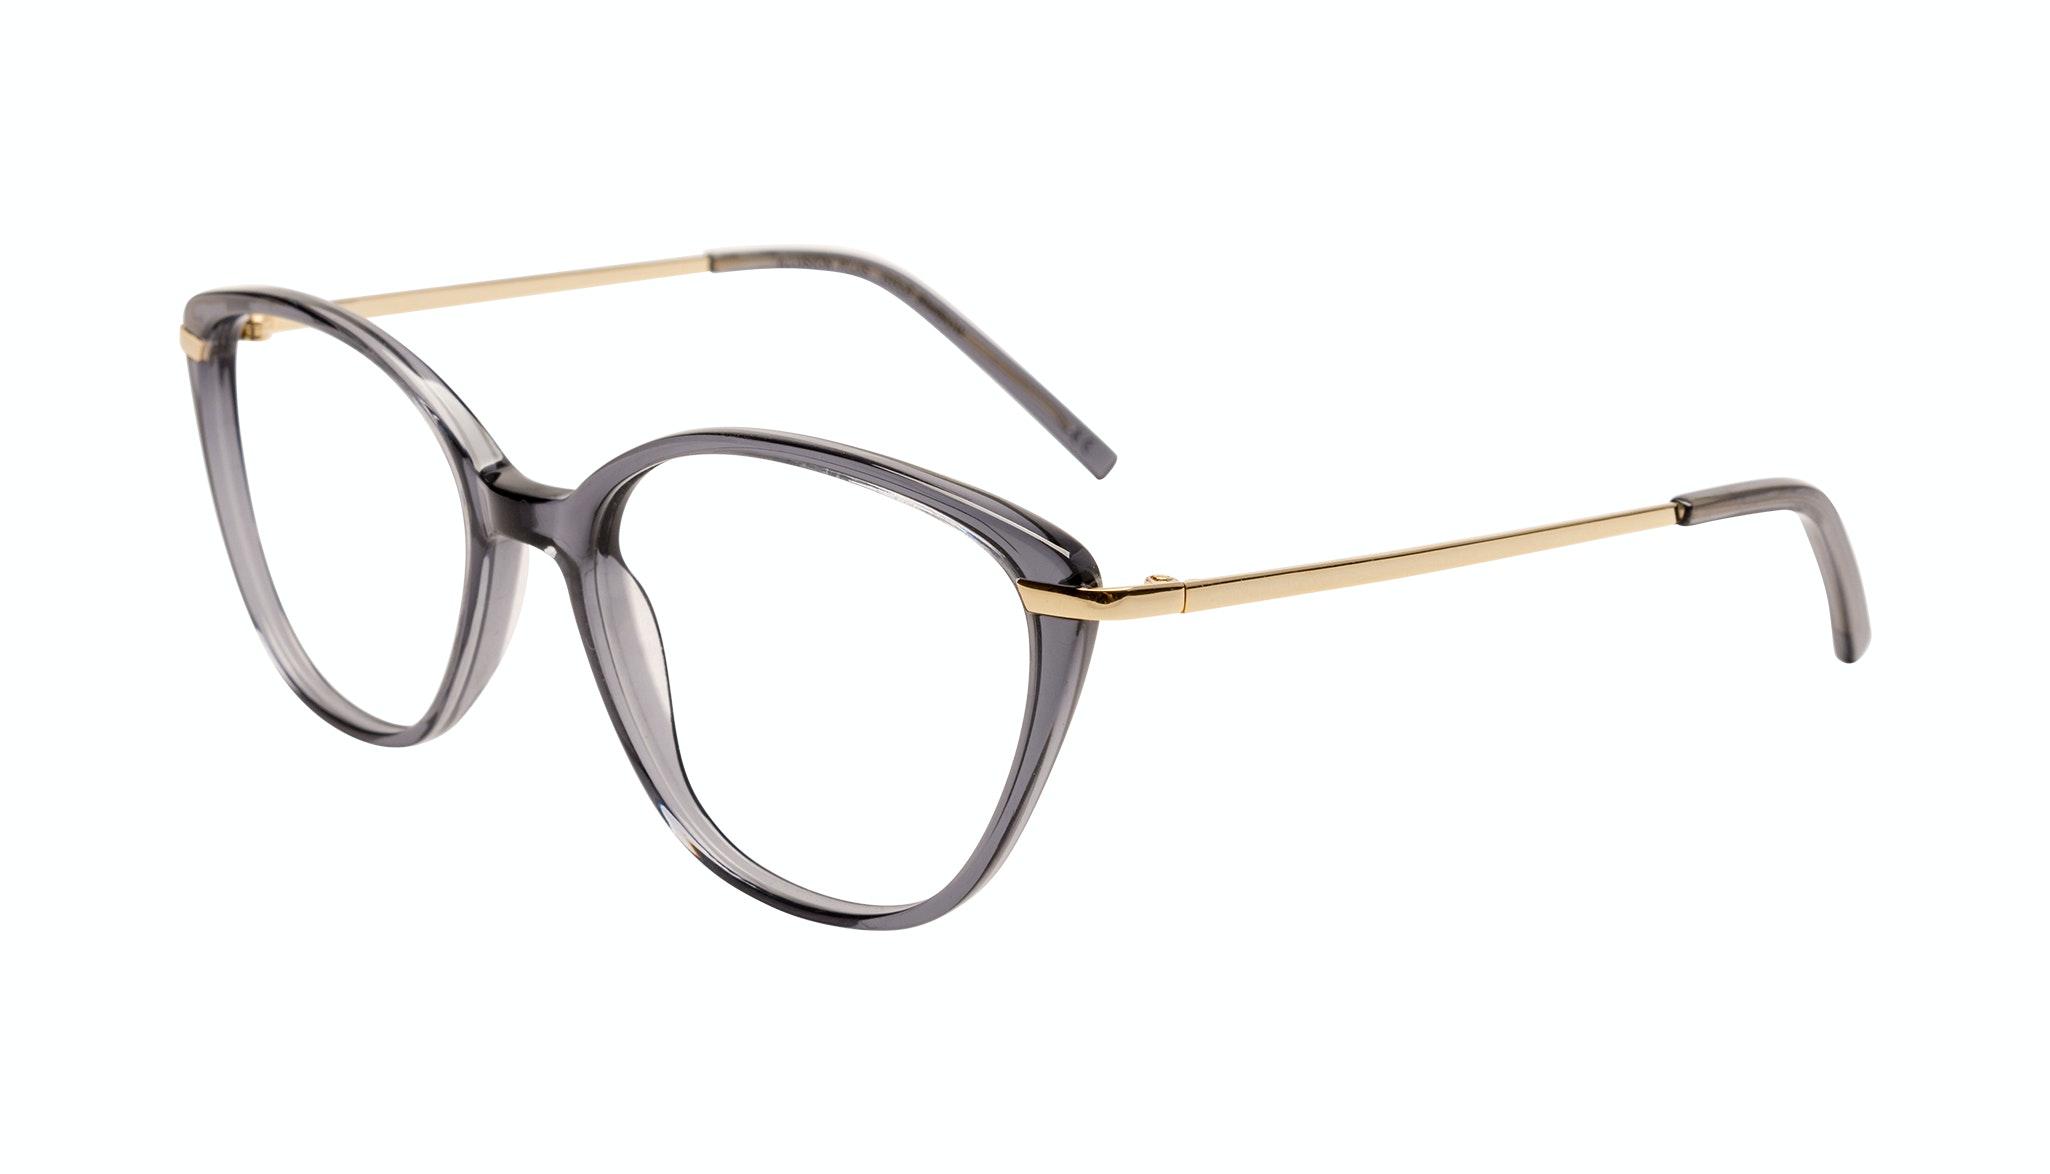 Affordable Fashion Glasses Cat Eye Eyeglasses Women Illusion Plus Gold Shadow Tilt